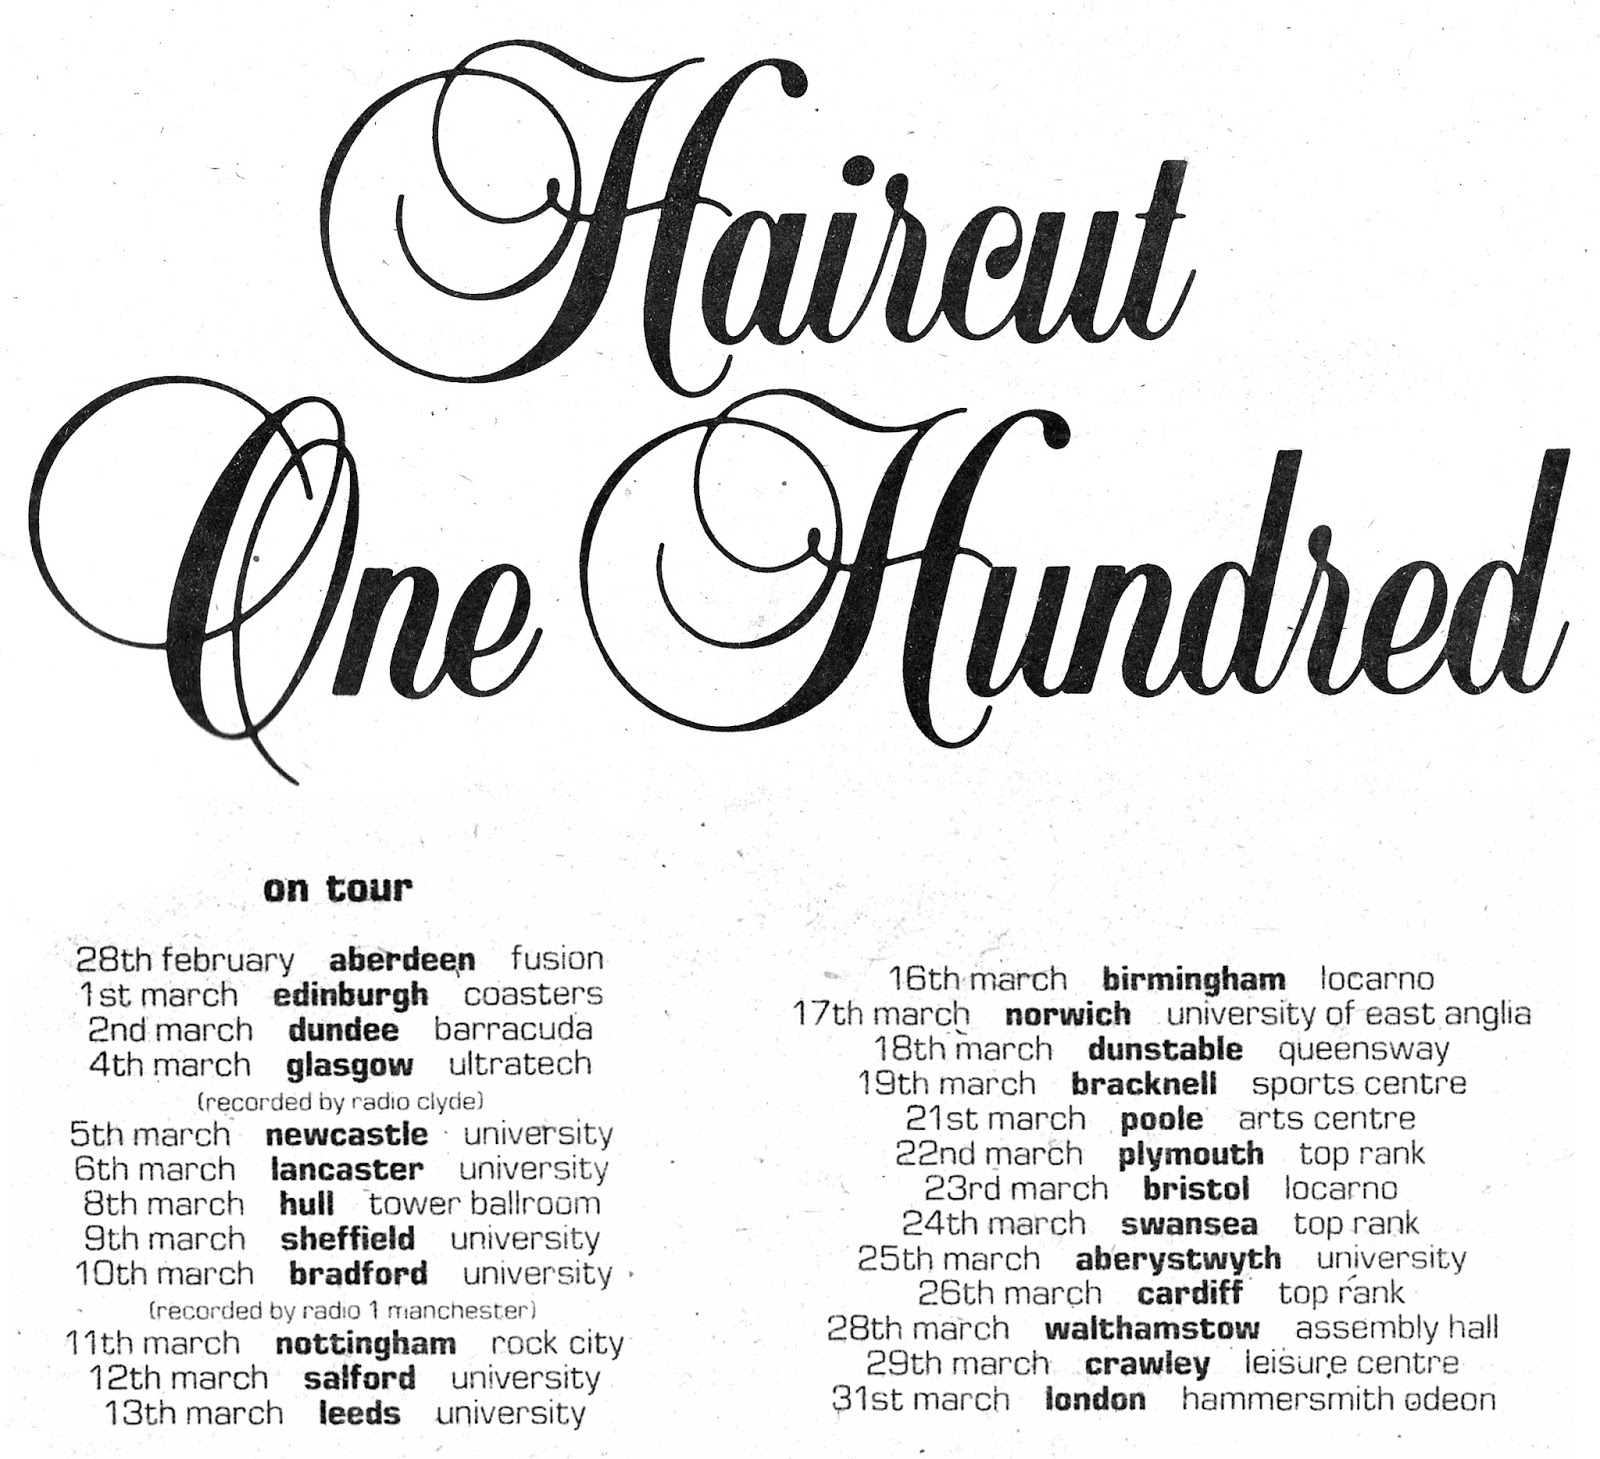 Retro Dundee Haircut 100 Caird Hall 1982